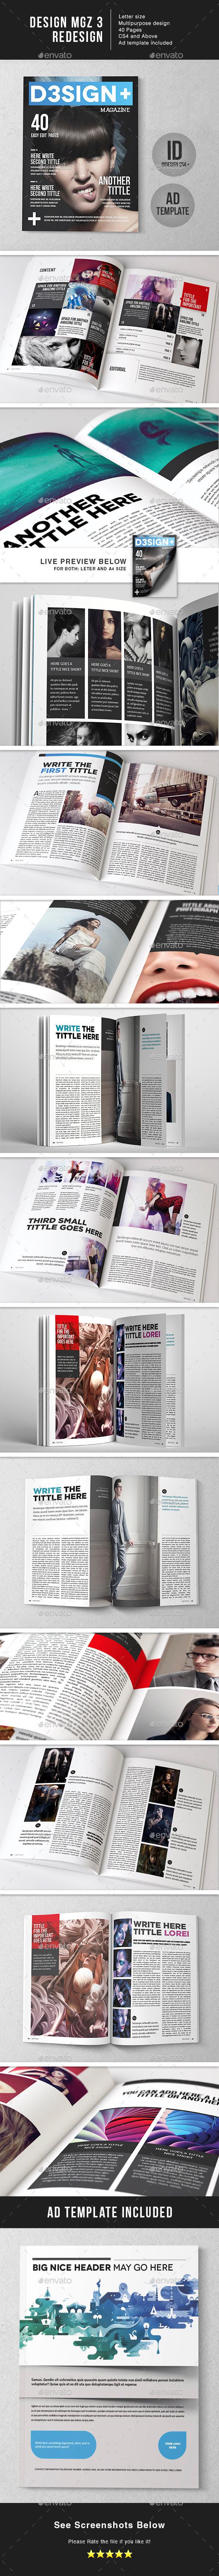 Design Magazine 7 Template - Magazines Print Templates